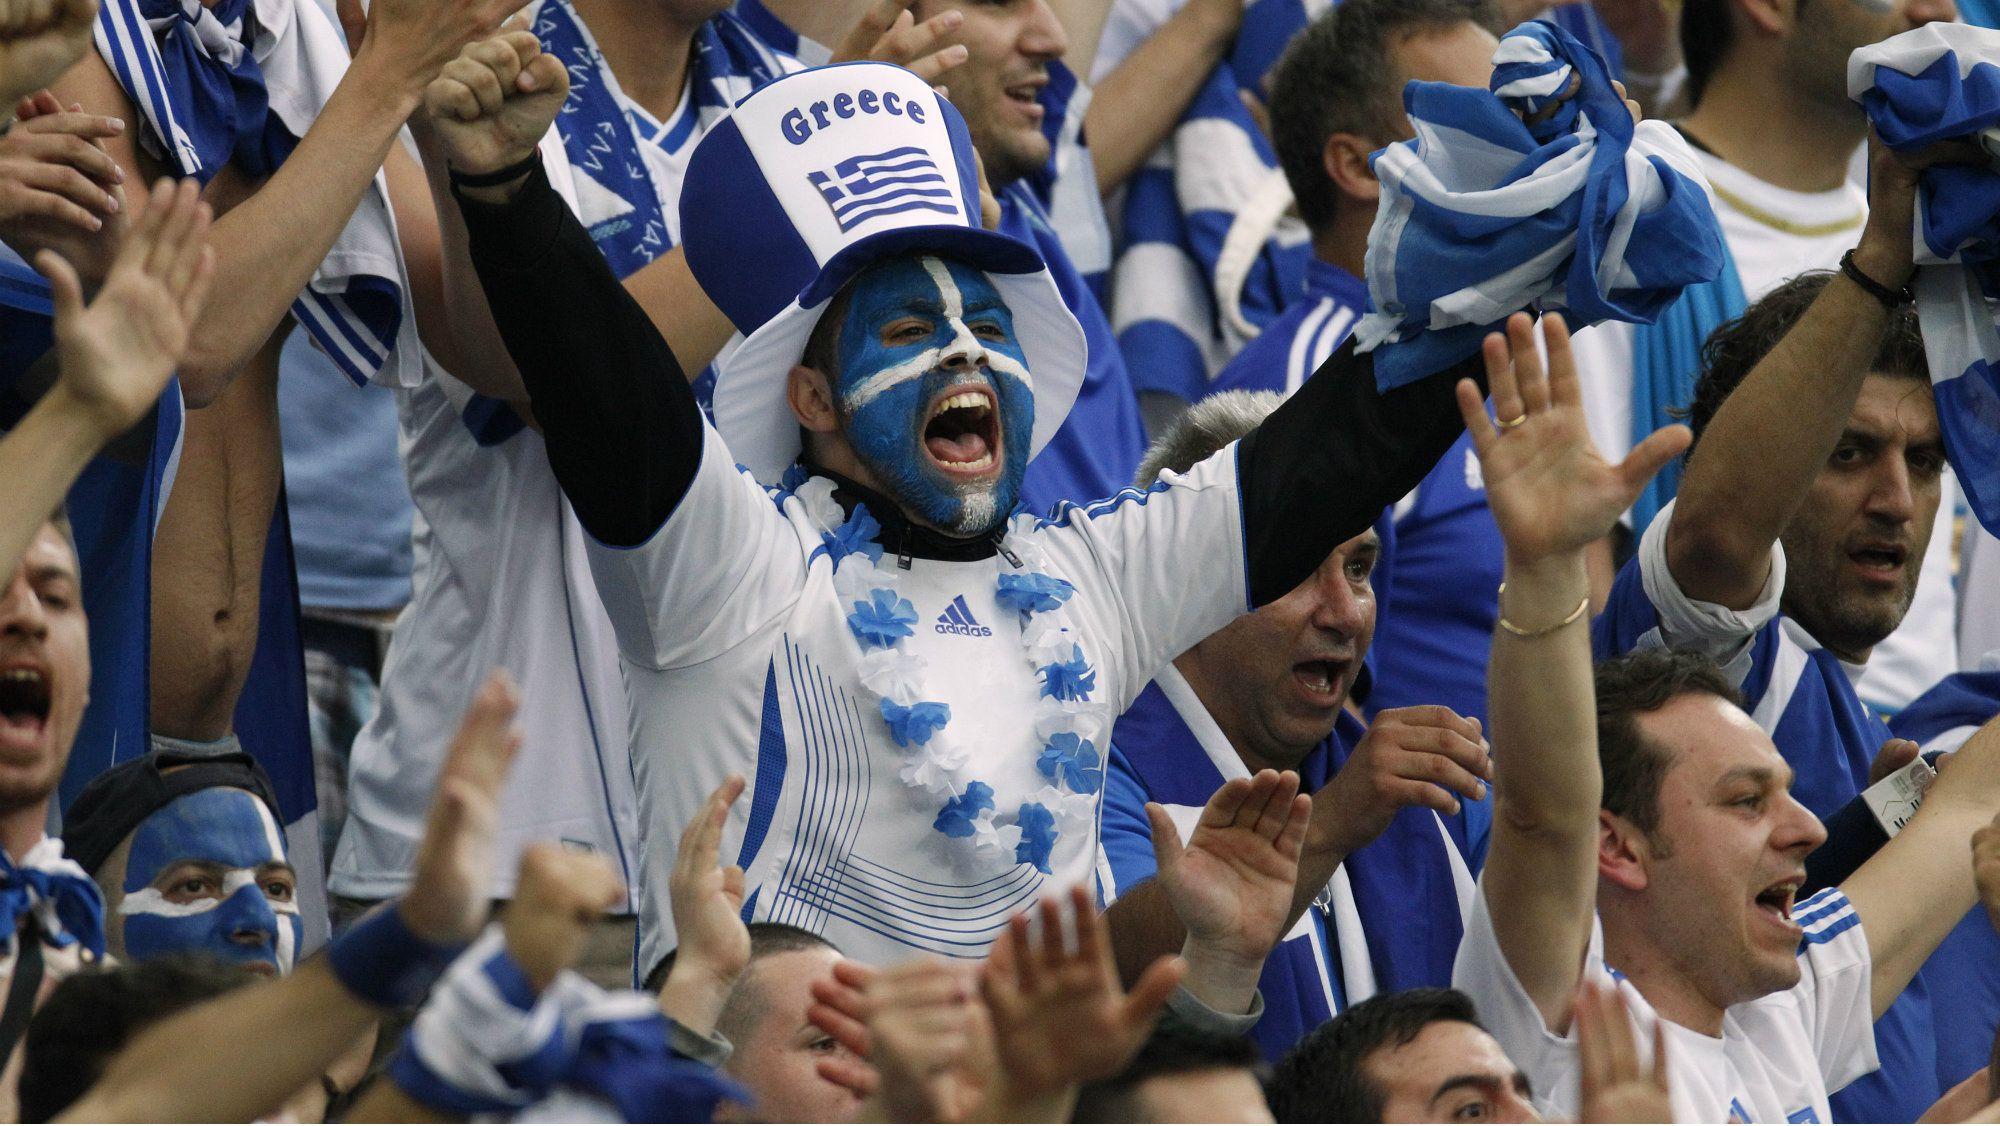 Greece's fans cheer before a national soccer team match.